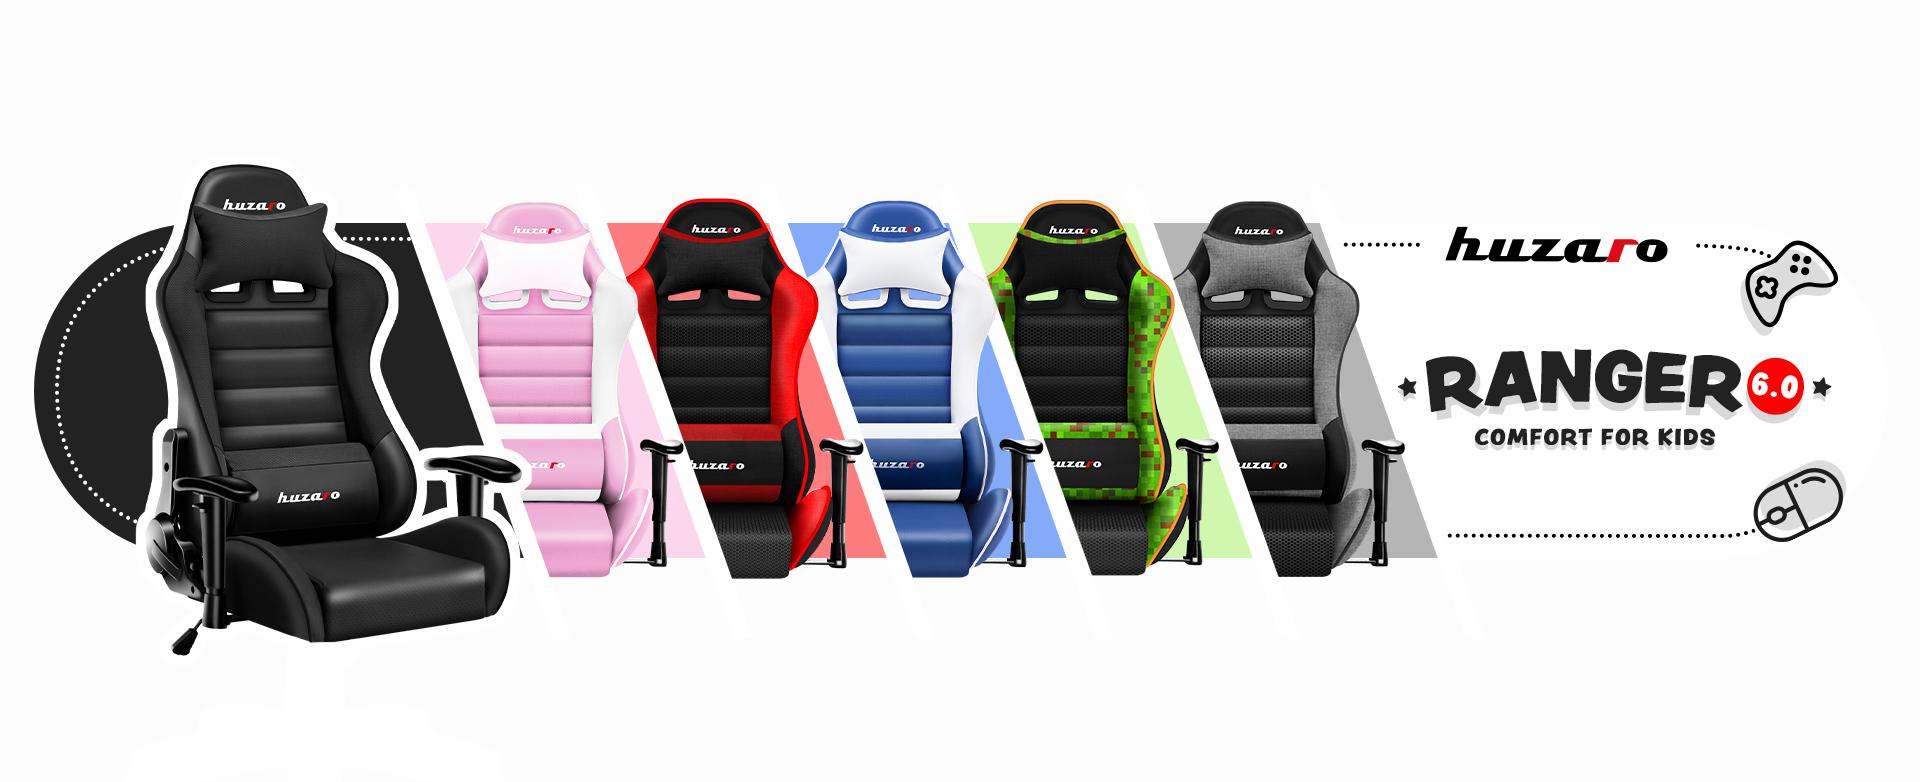 Dostępne kolory fotela Huzaro Ranger 6.0